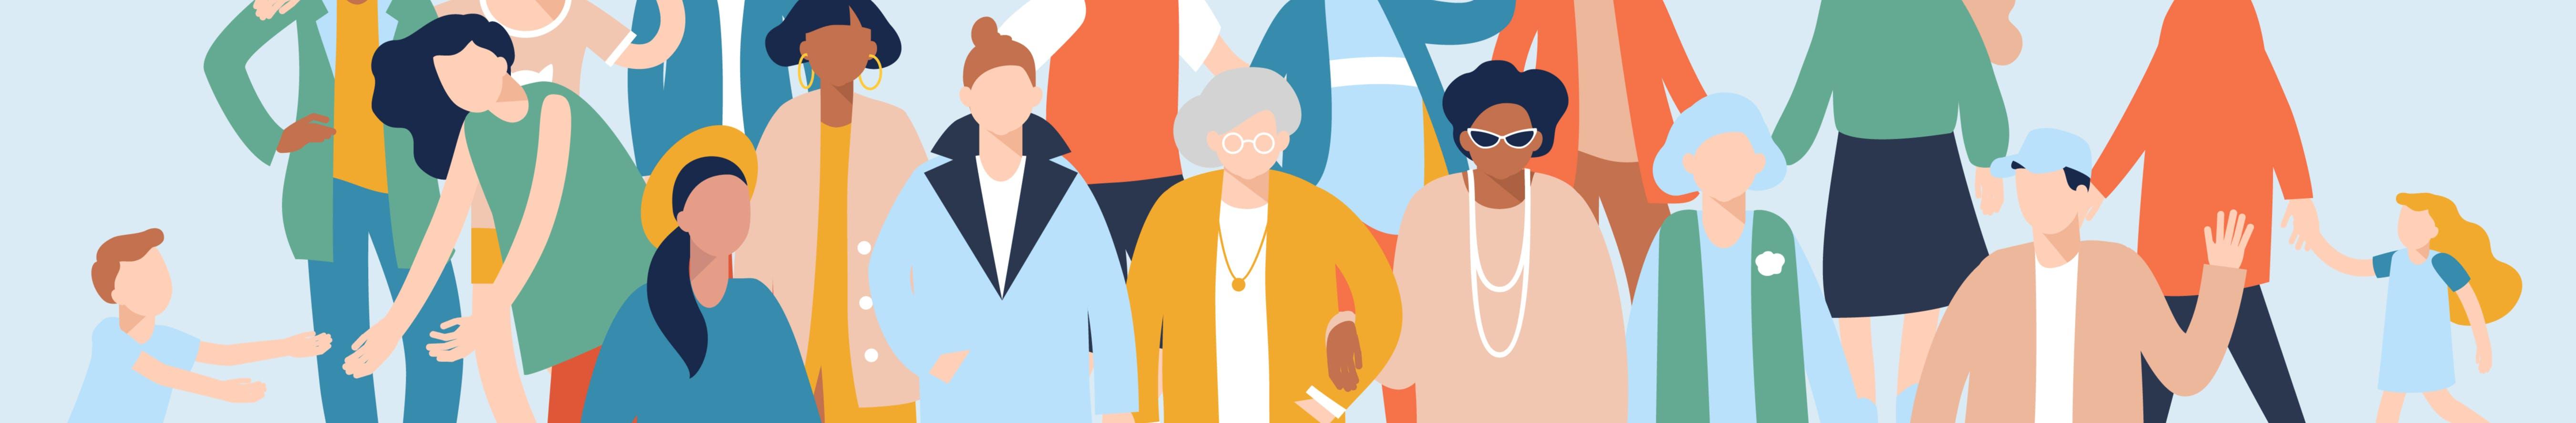 Digital illustration of community members